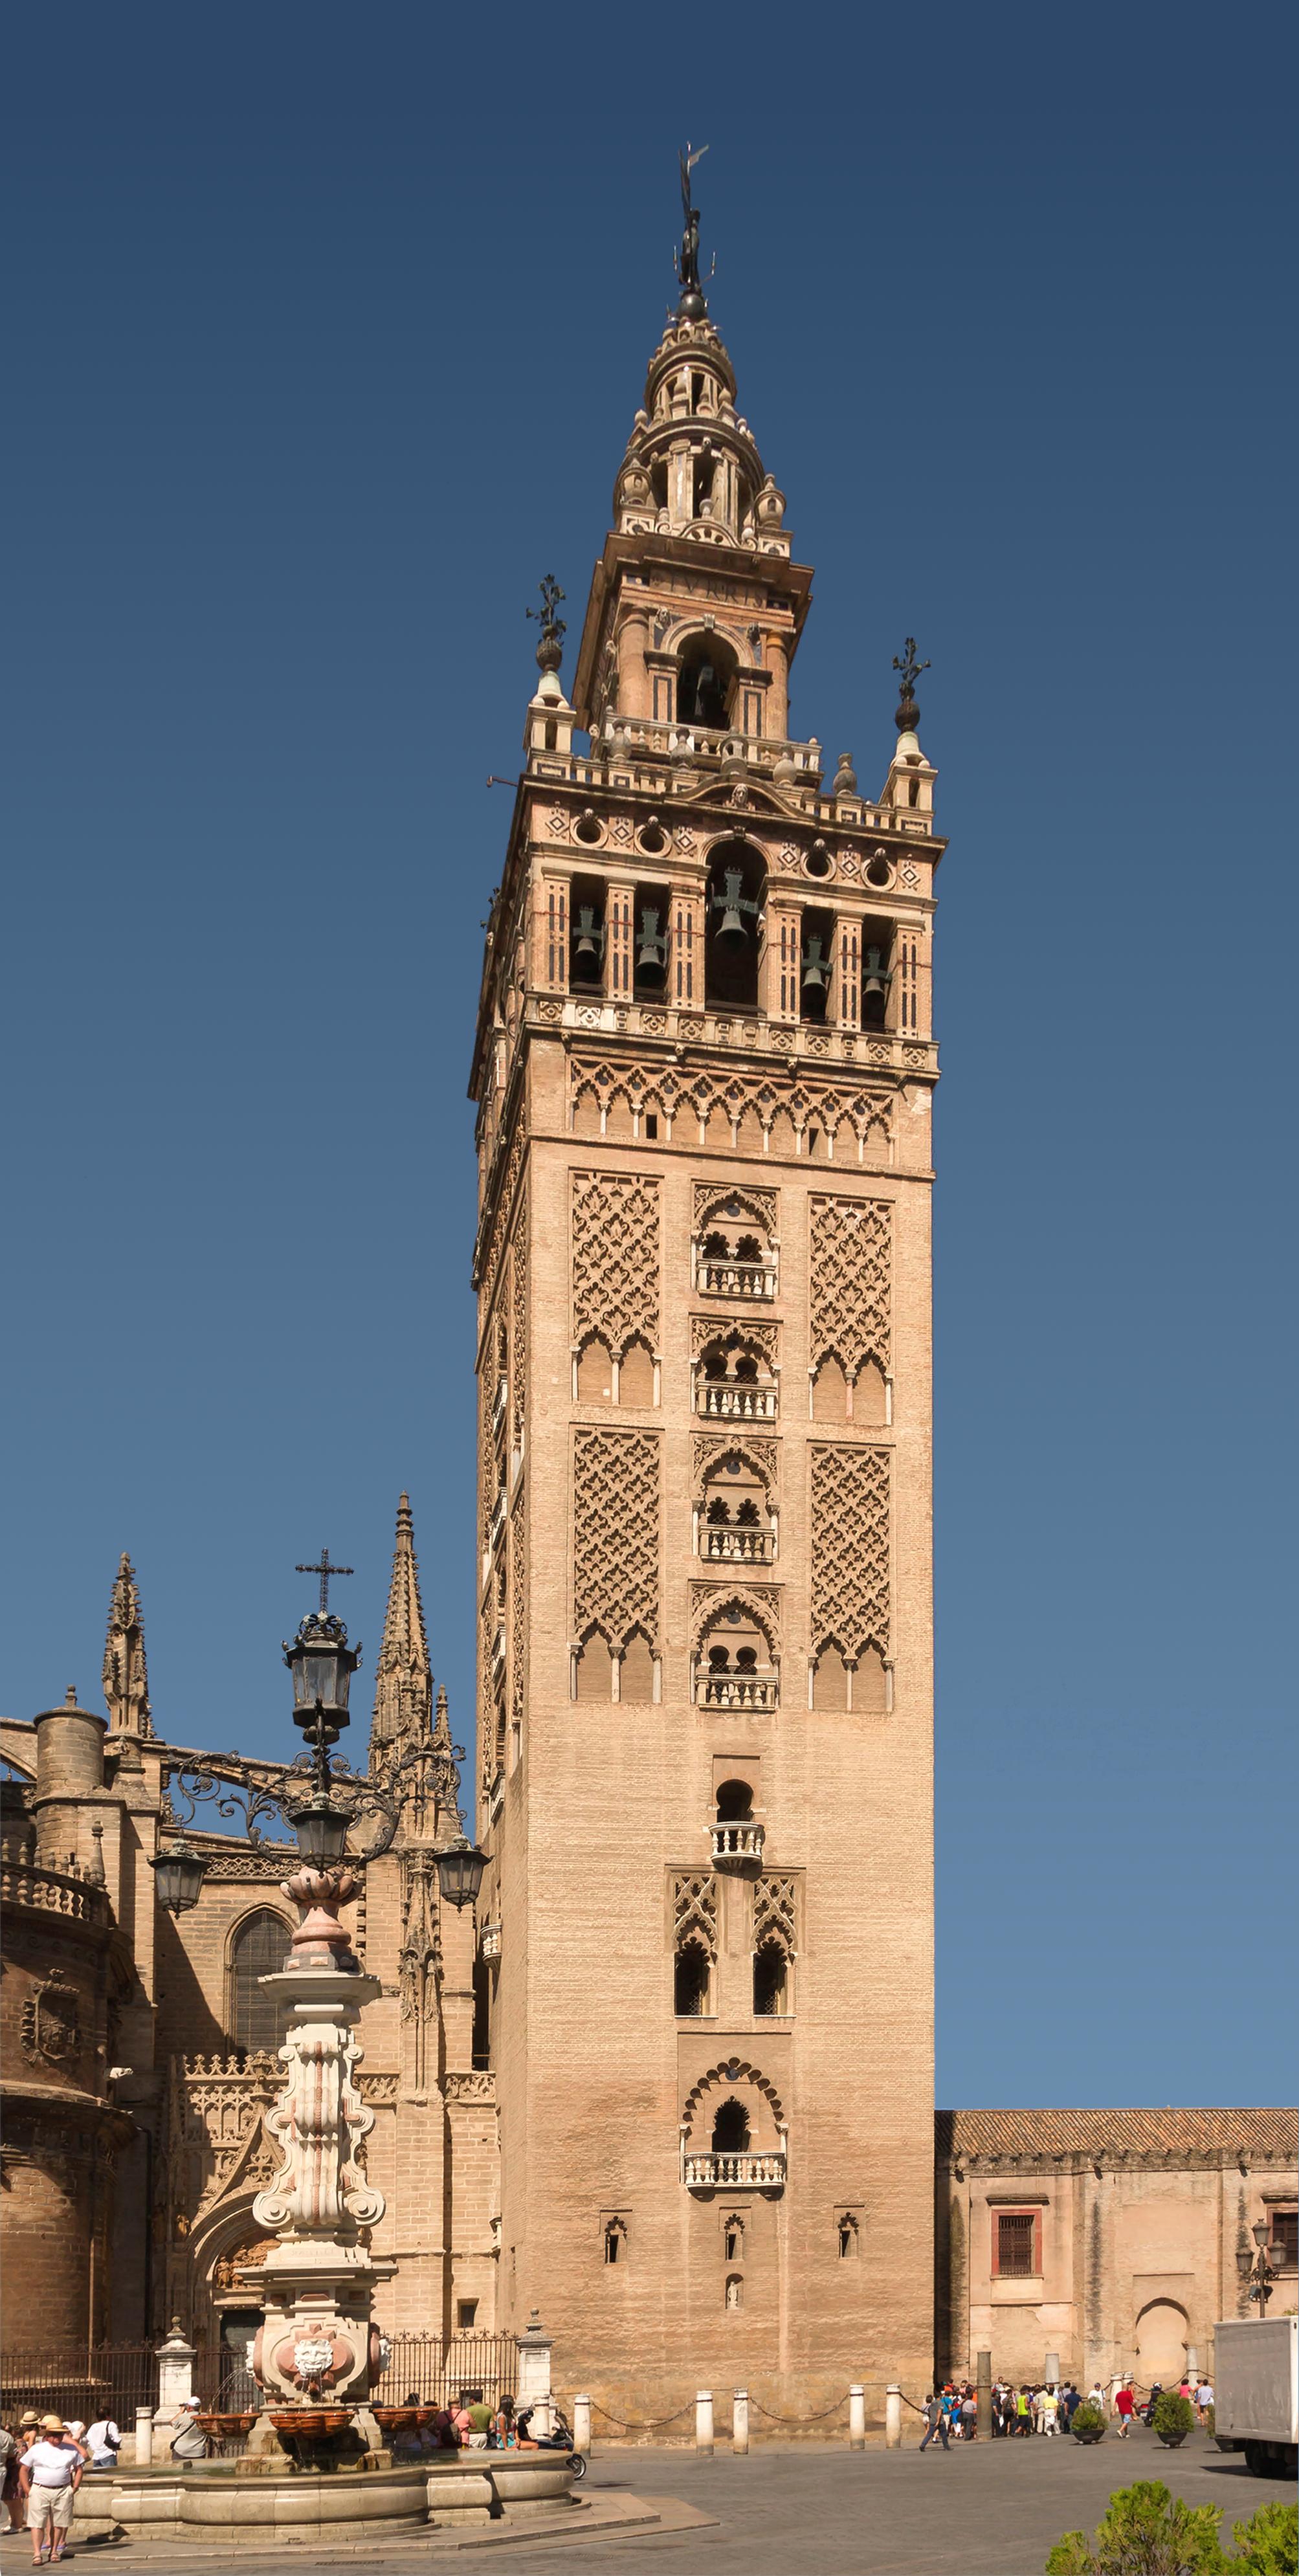 File:La Giralda August 2012 Seville Spain.jpg - Wikimedia Commons